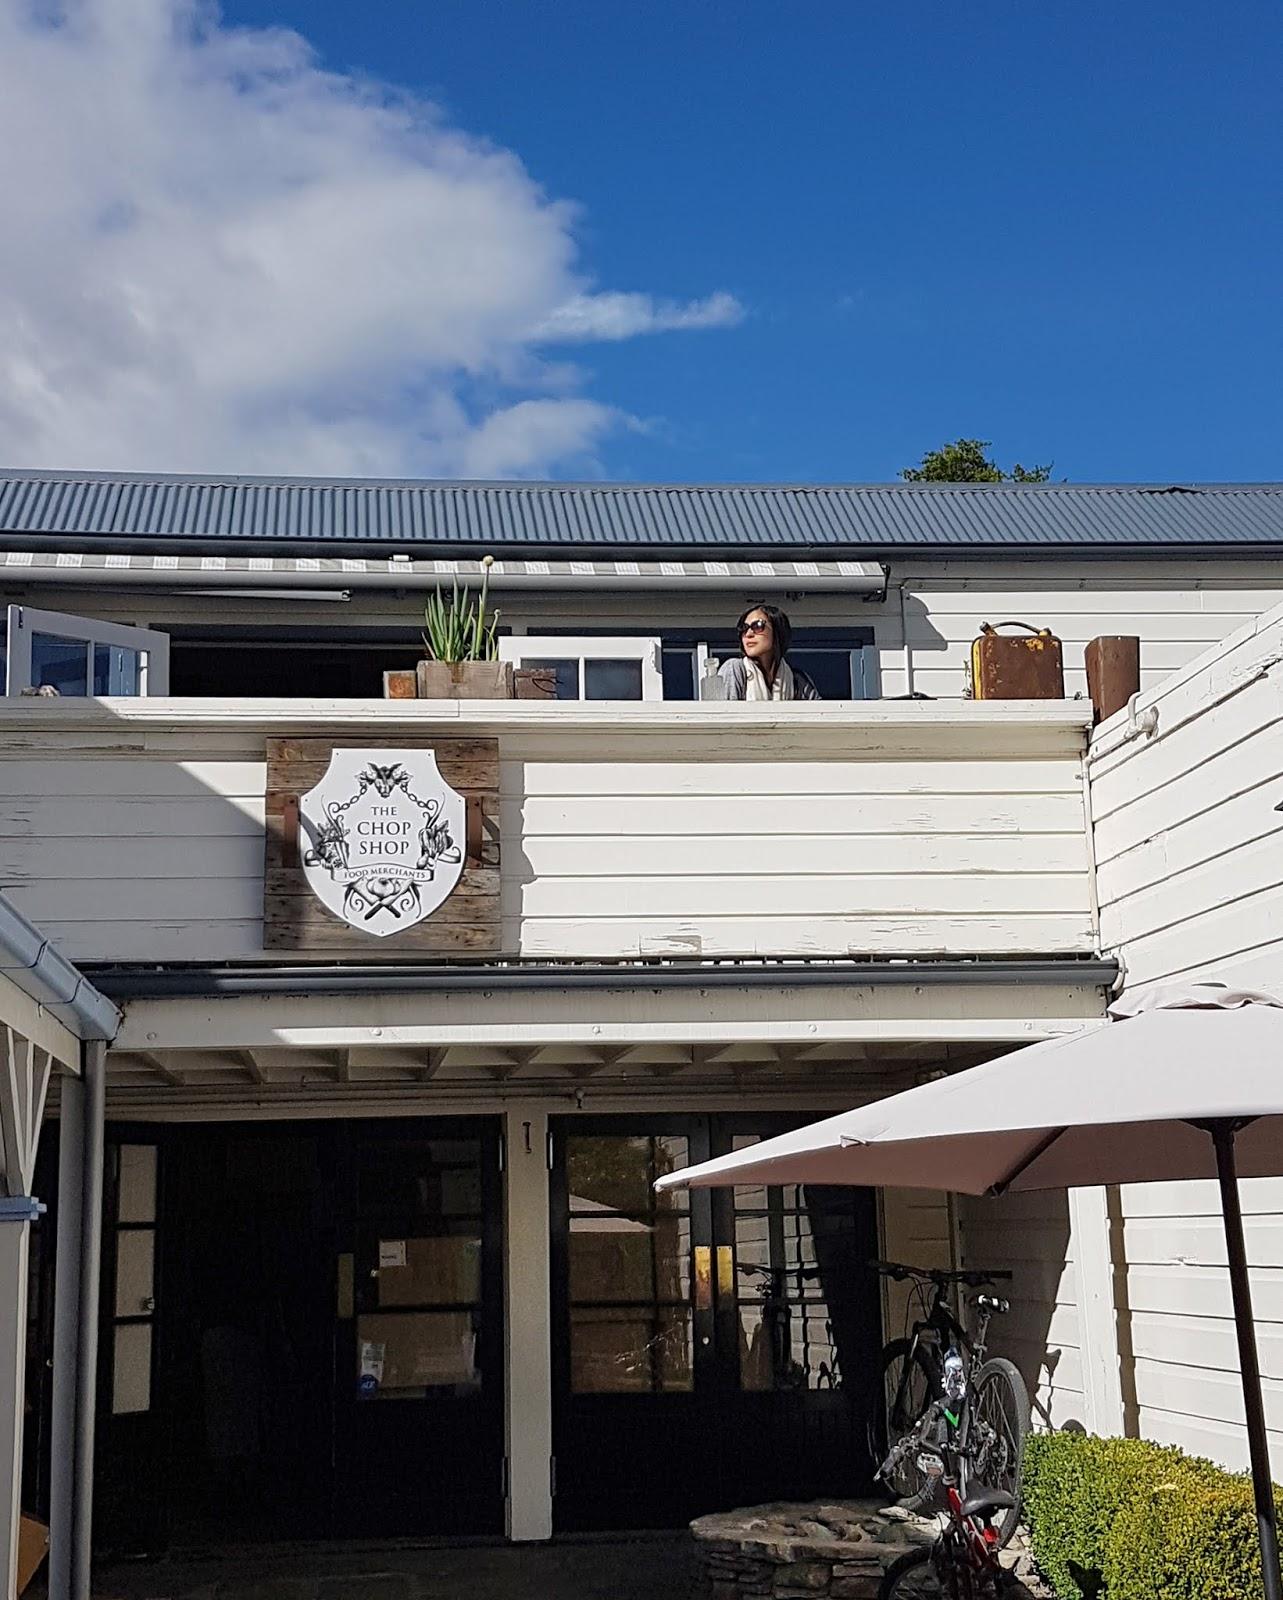 Euriental | luxury travel & style | The Chop Shop Arrowtown, New Zealand